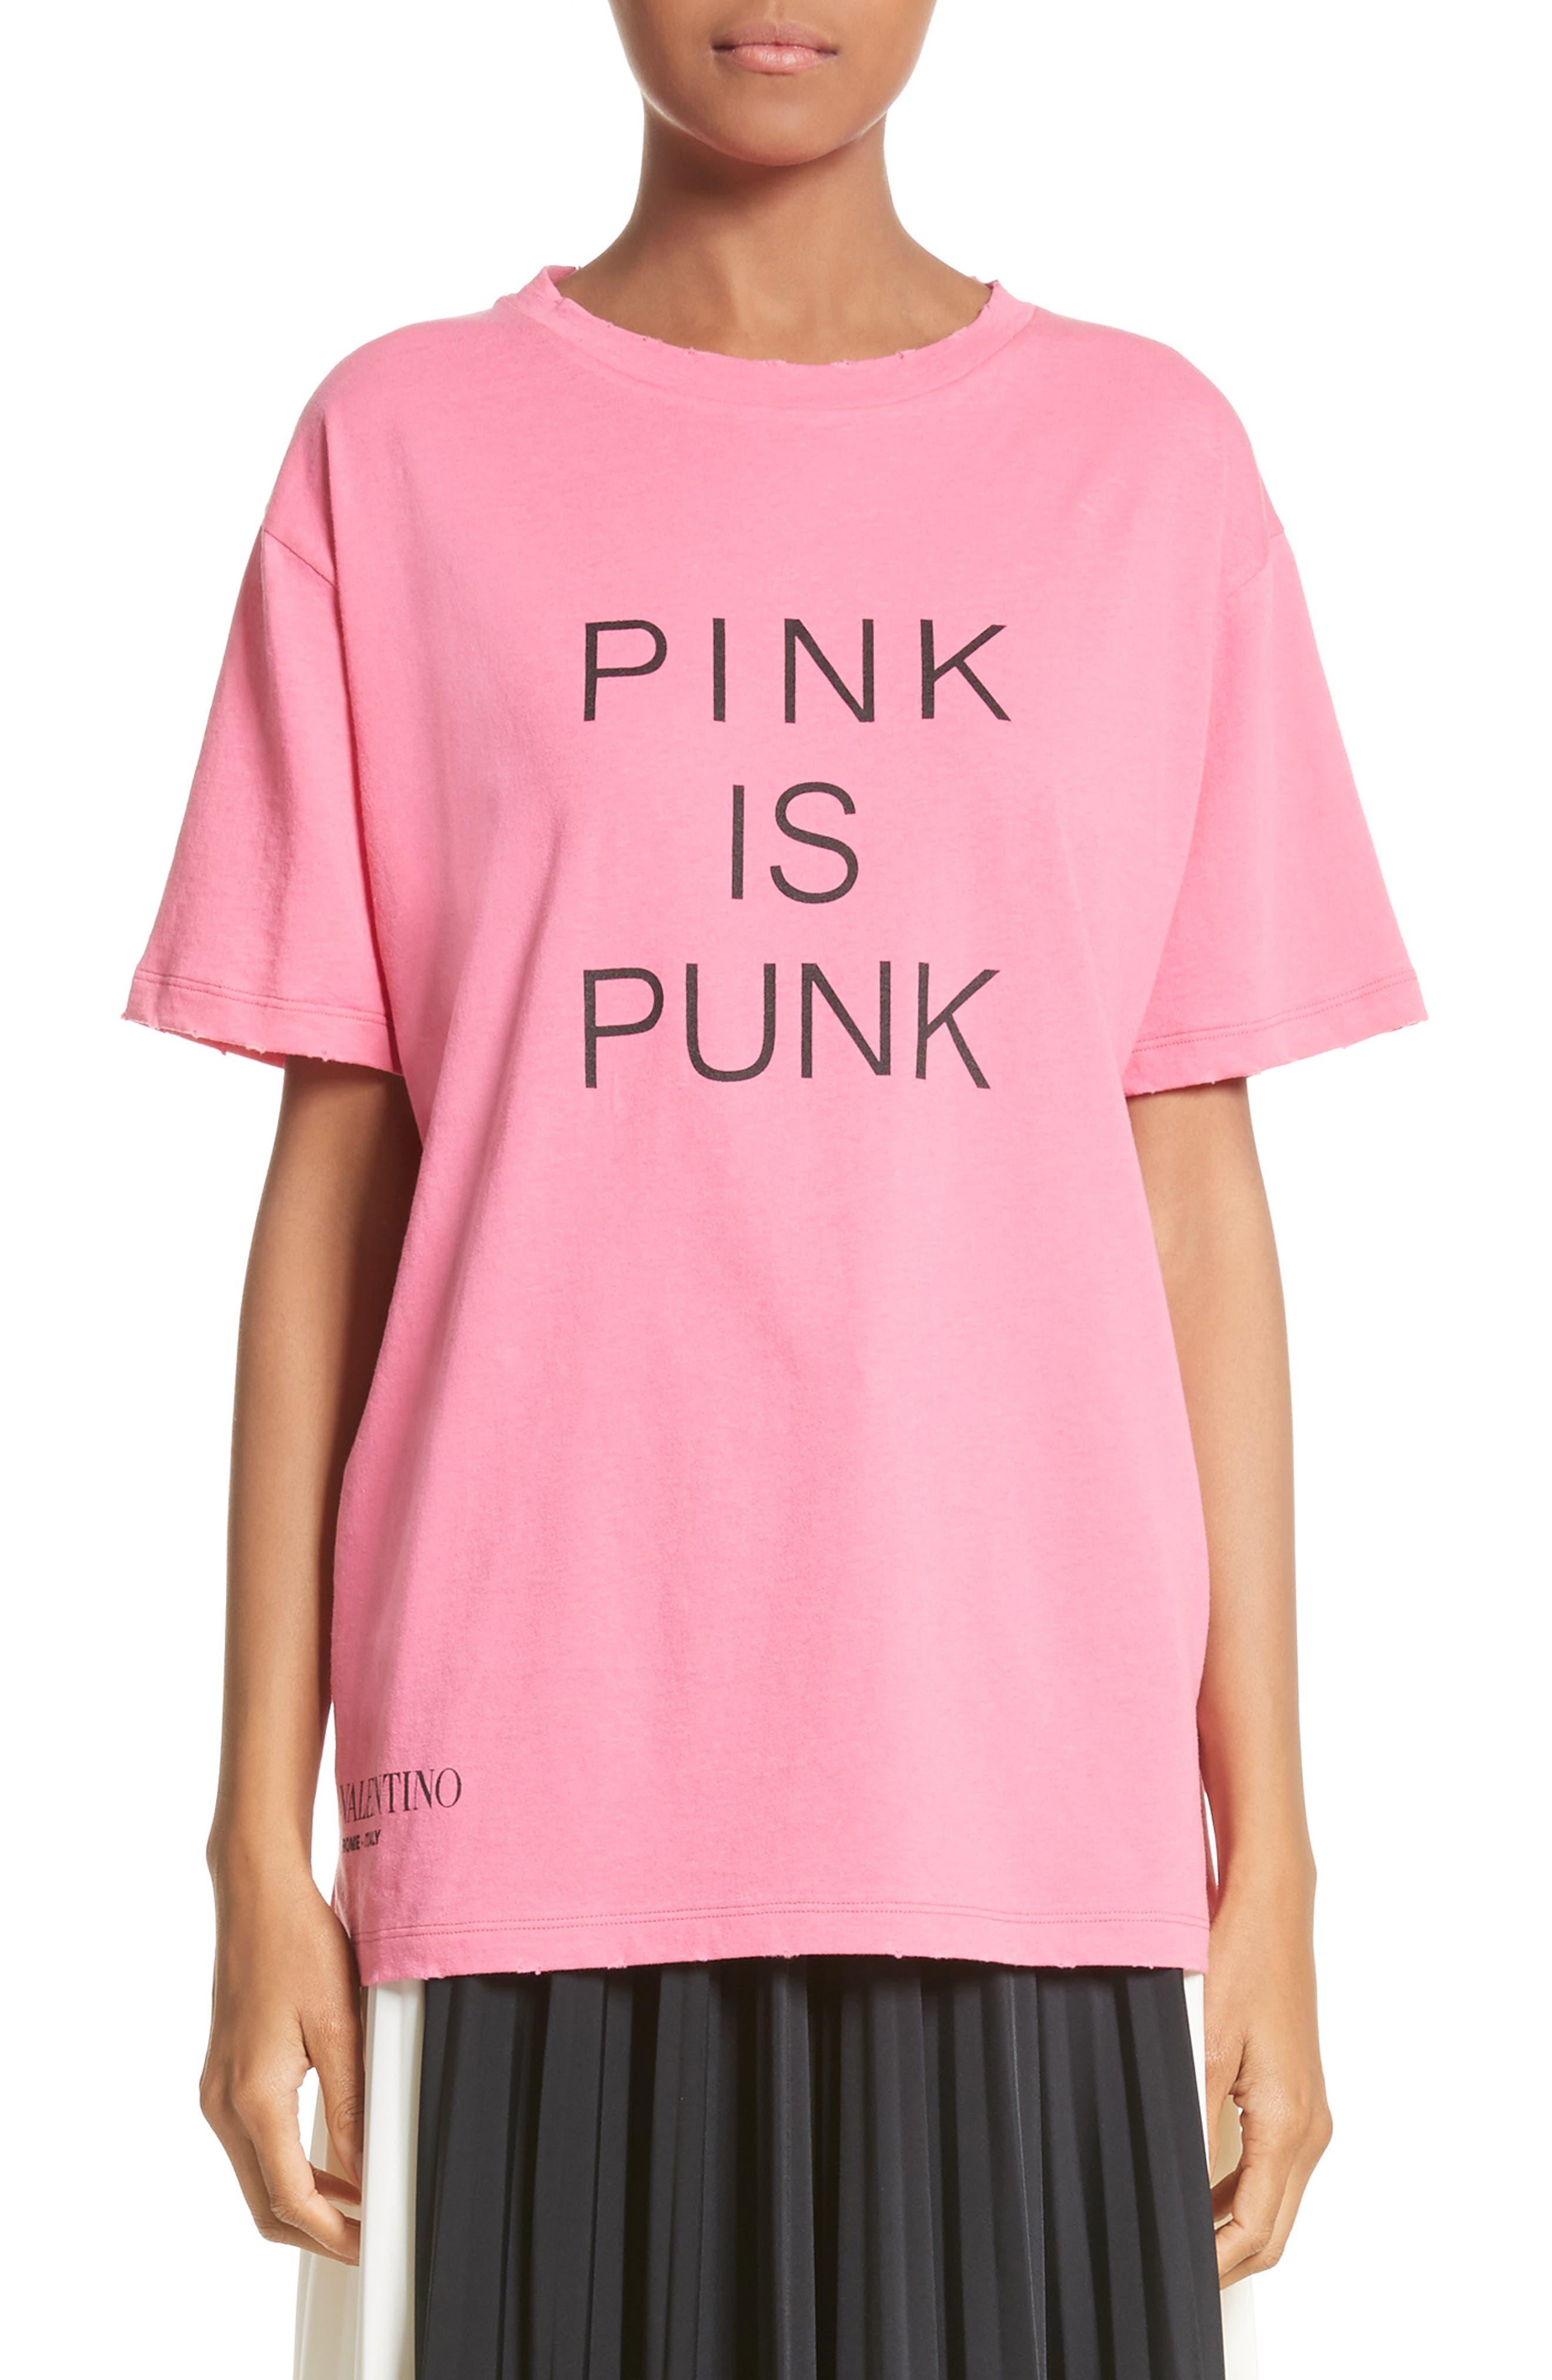 Main Image - Valentino Pink Is Punk Cotton Tee